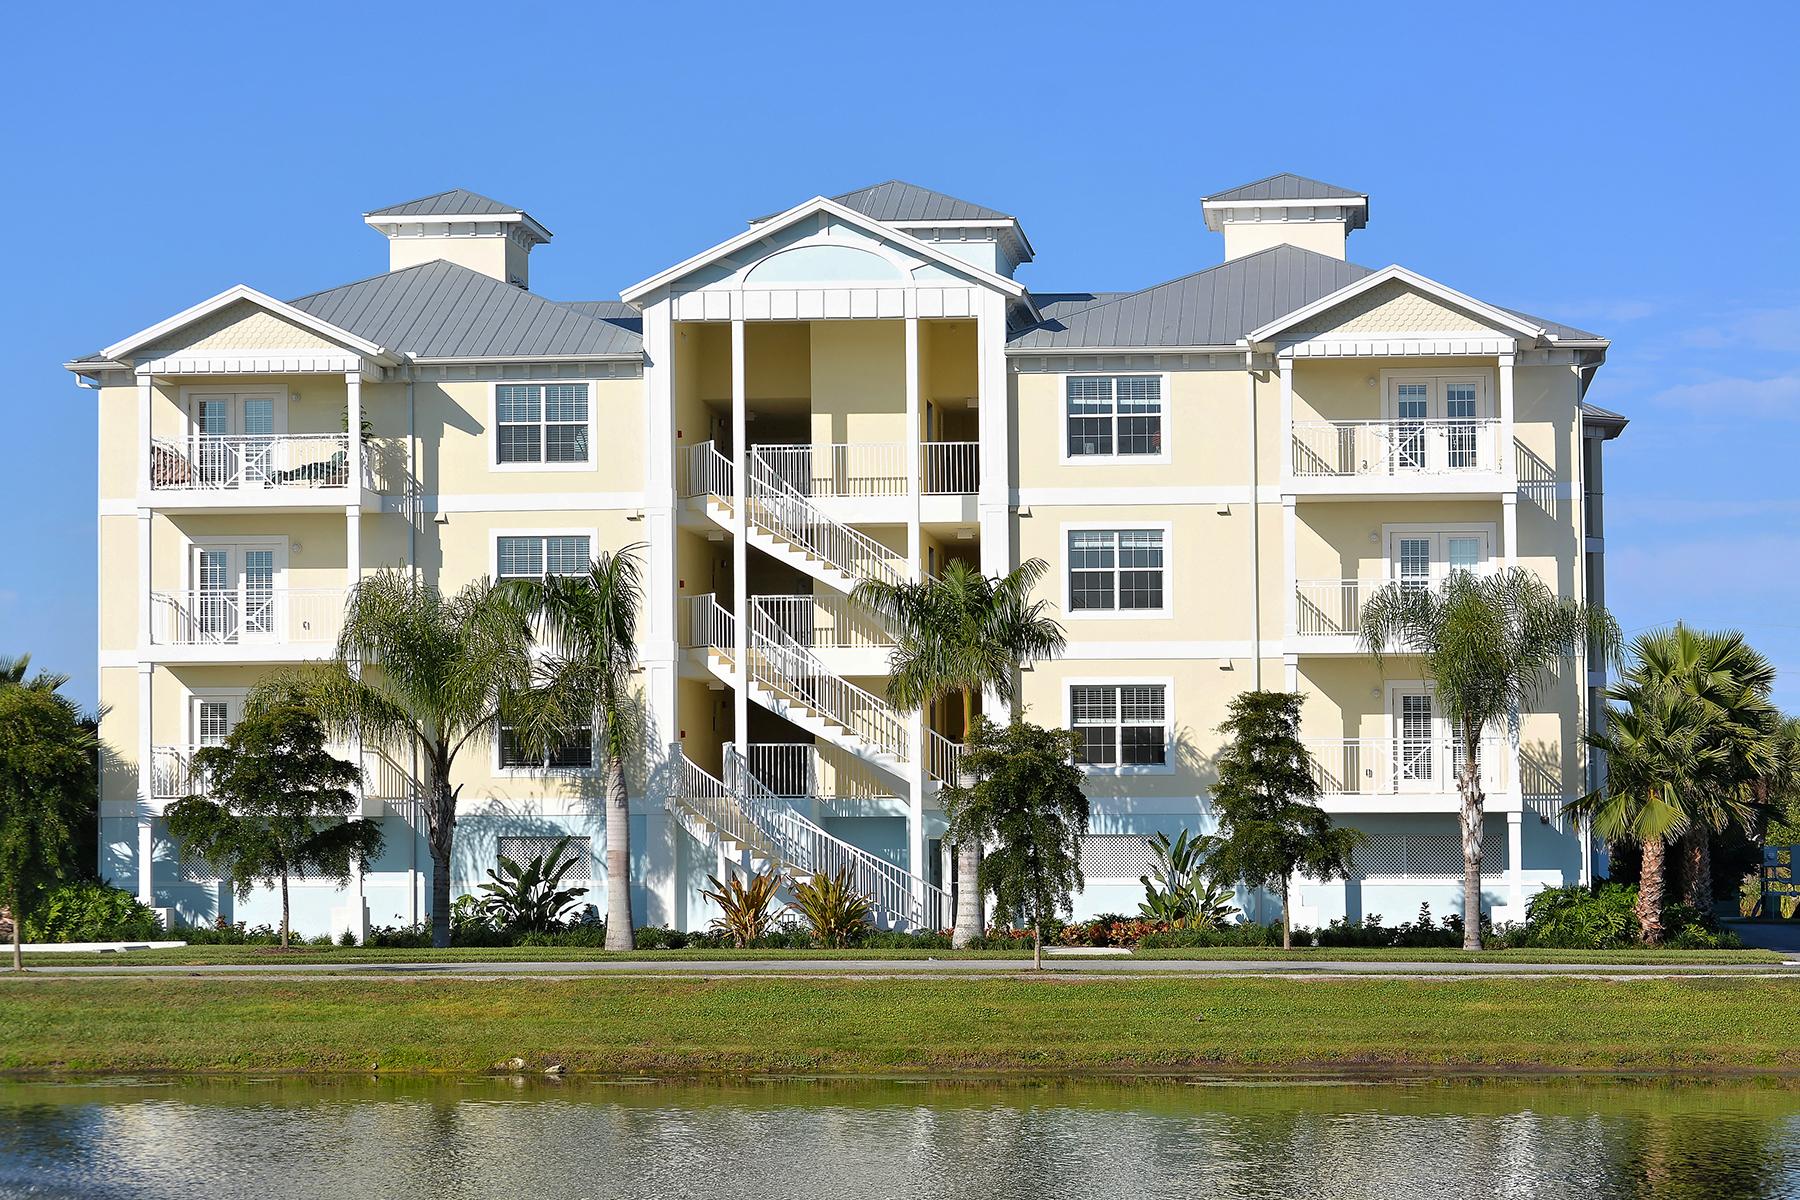 Condominium for Sale at PALMA SOLA BAY CLUB 7710 34th Ave W 302 Bradenton, Florida 34209 United States